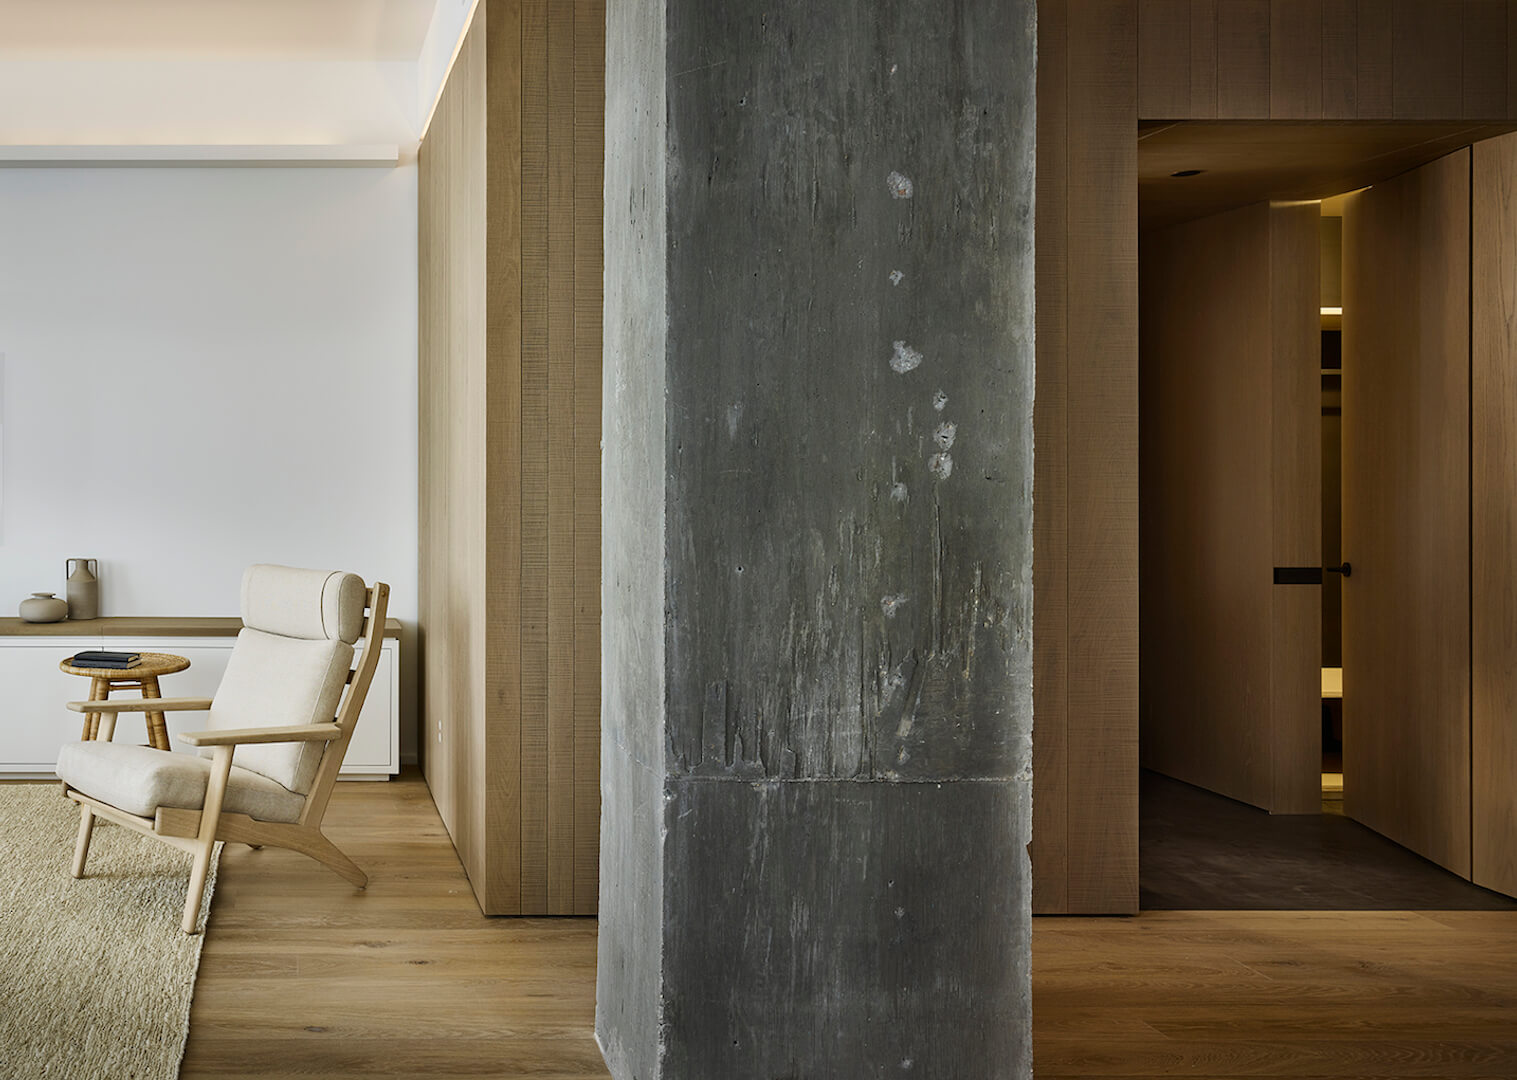 est living global interiors river loft robert young architects RRA 12 LAIGHT F.OUDEMAN 2015 ¬ 07